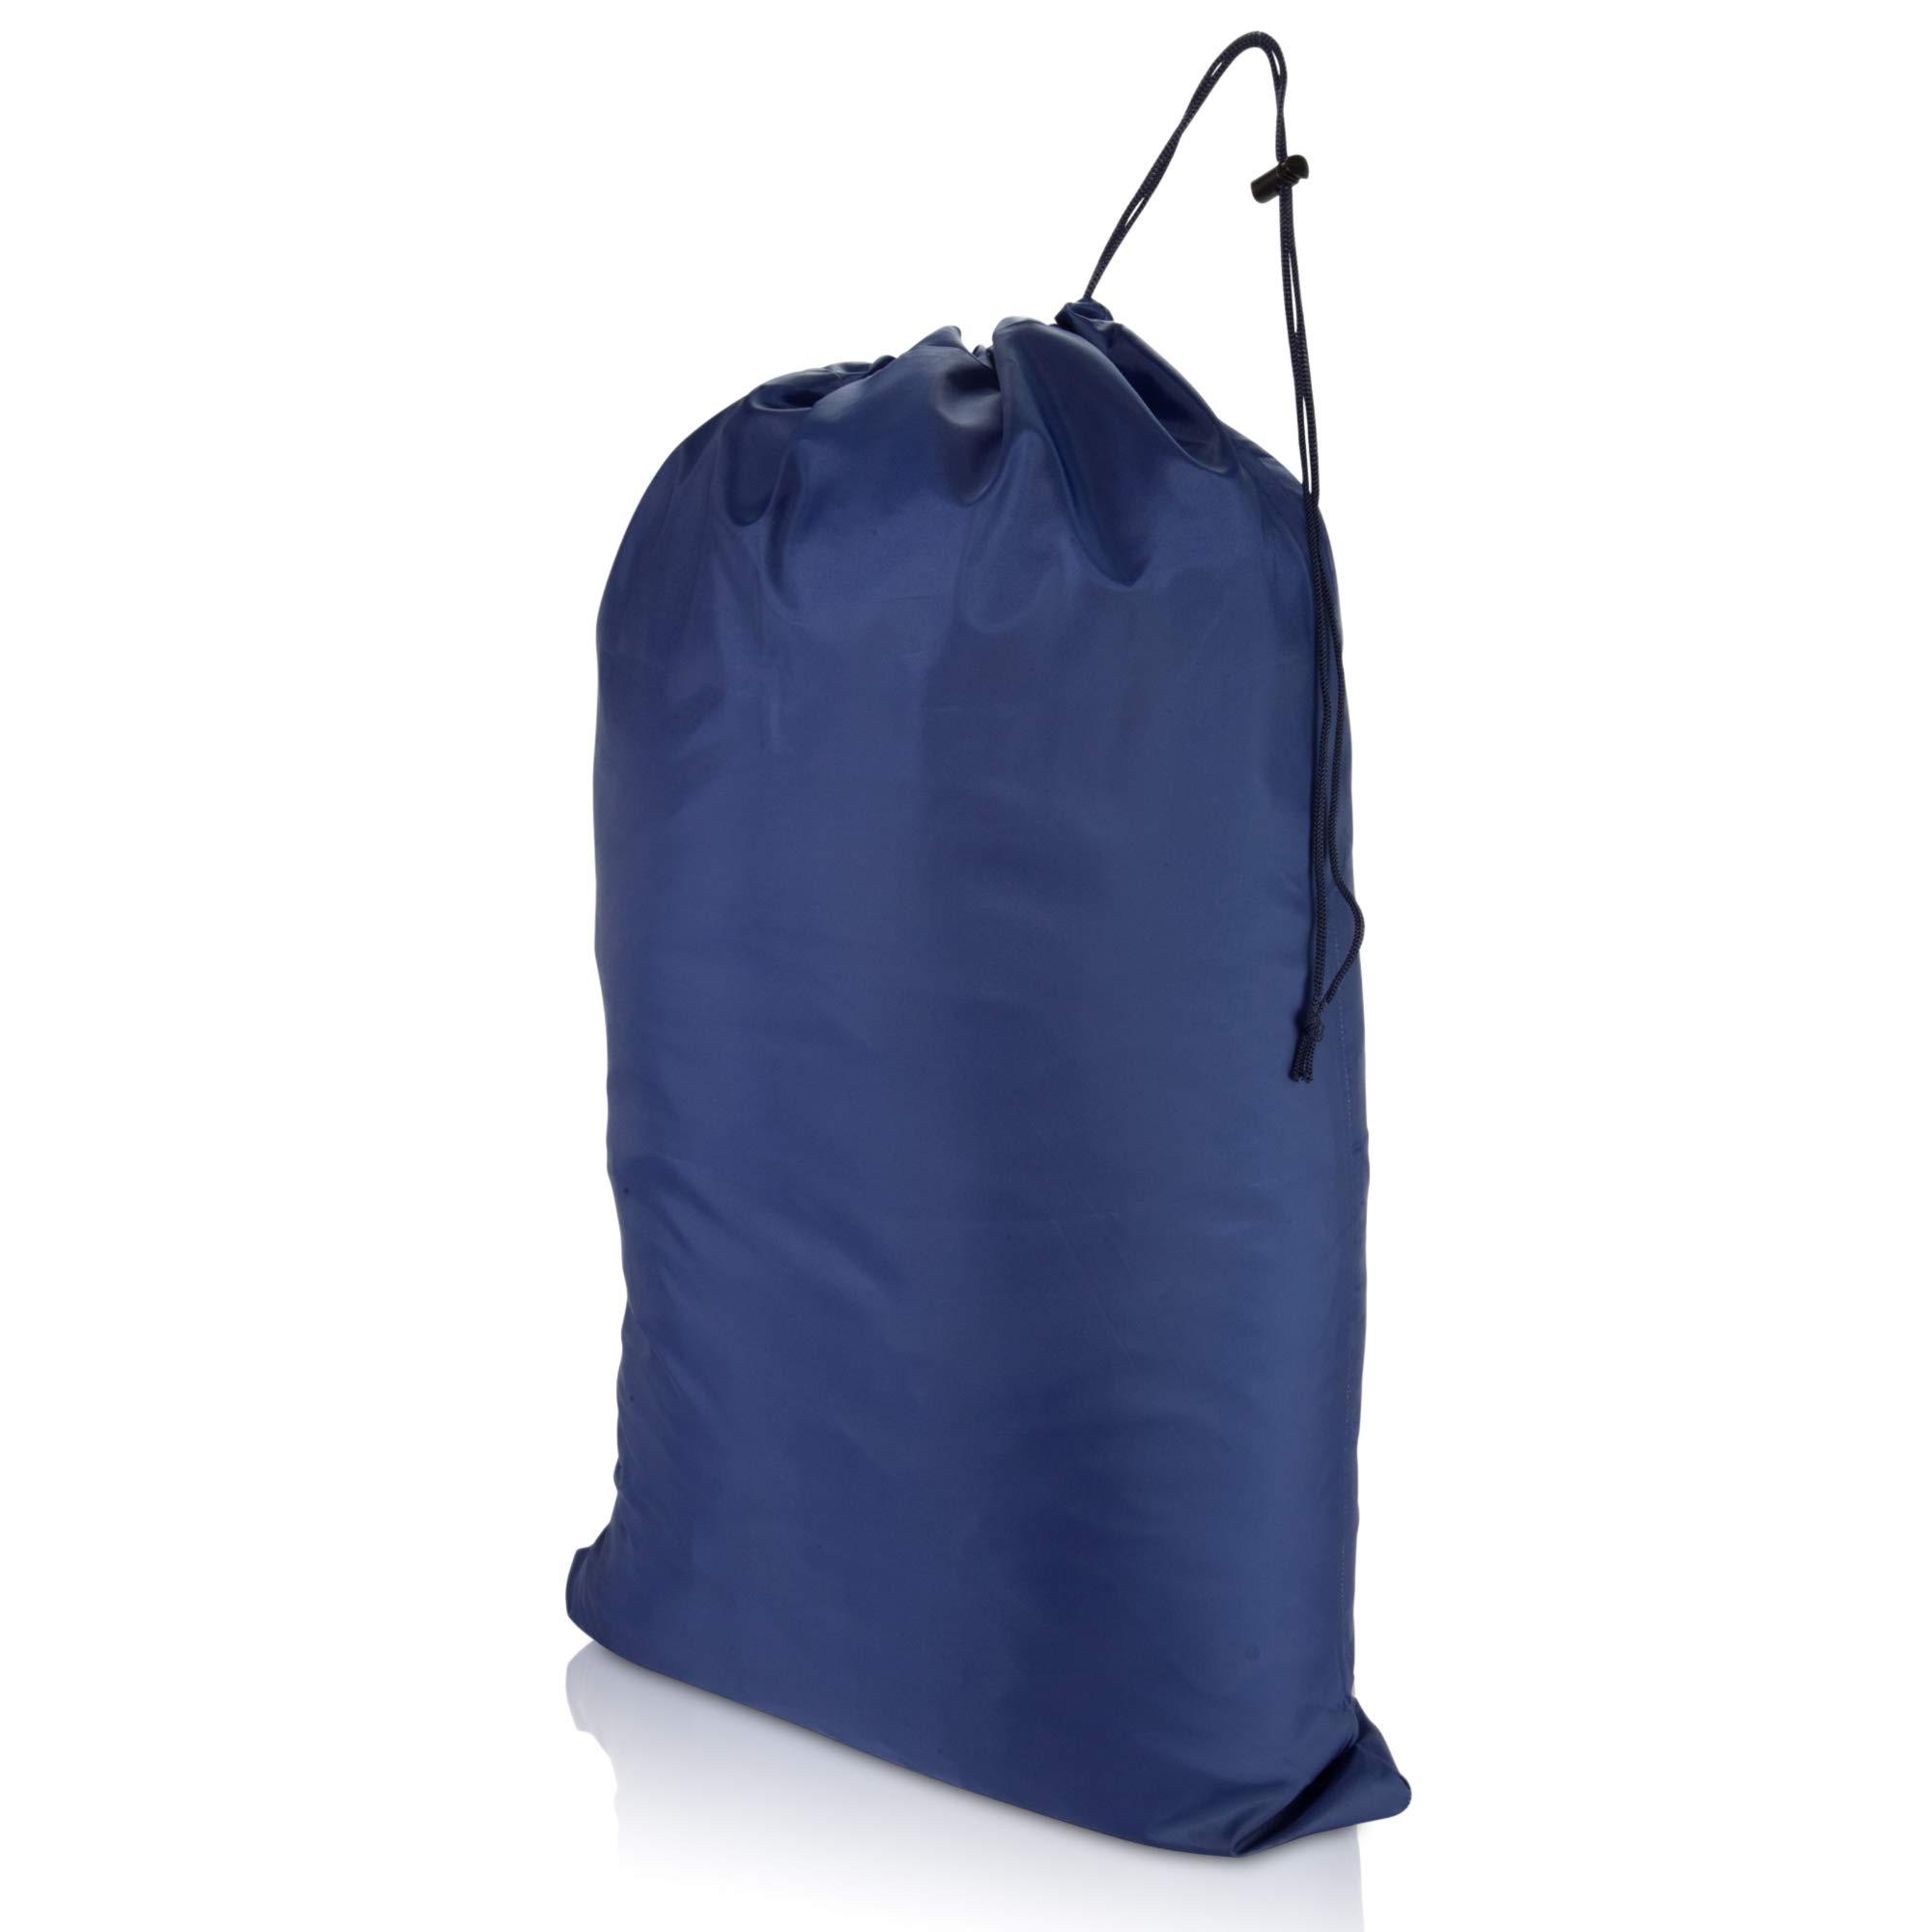 DALIX Large Laundry Bag Drawstring Sack Heavy Duty Tear Resistant in Navy Blue